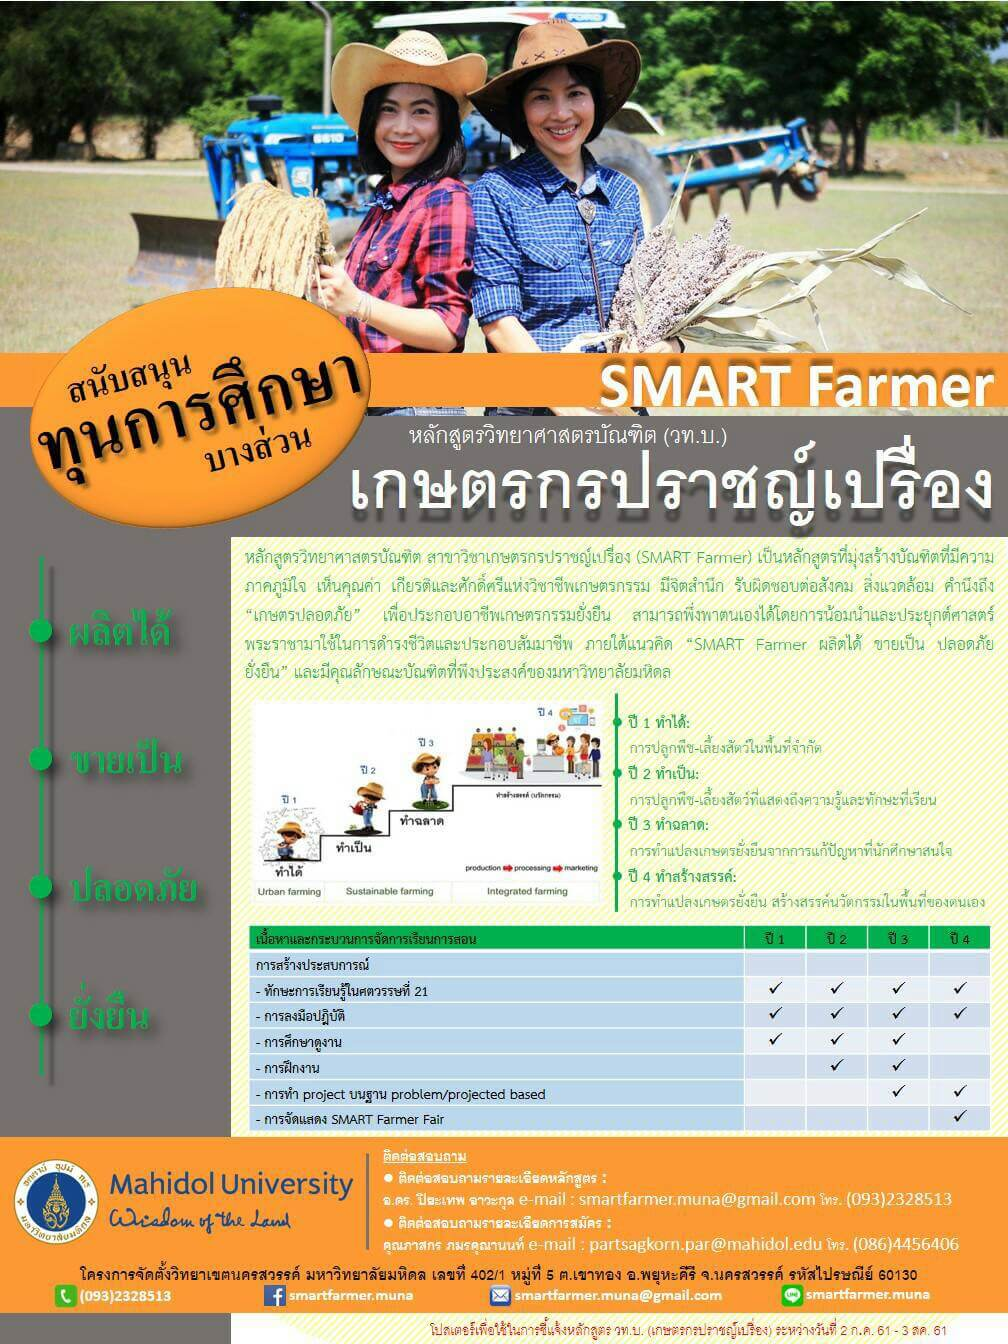 TCAS/รับตรง61 รอบ 5 เกษตรกรปราชญ์เปรื่อง/SMART Farmer ม.มหิดล-นครสวรรค์ 2561 (ระเบียบการ)